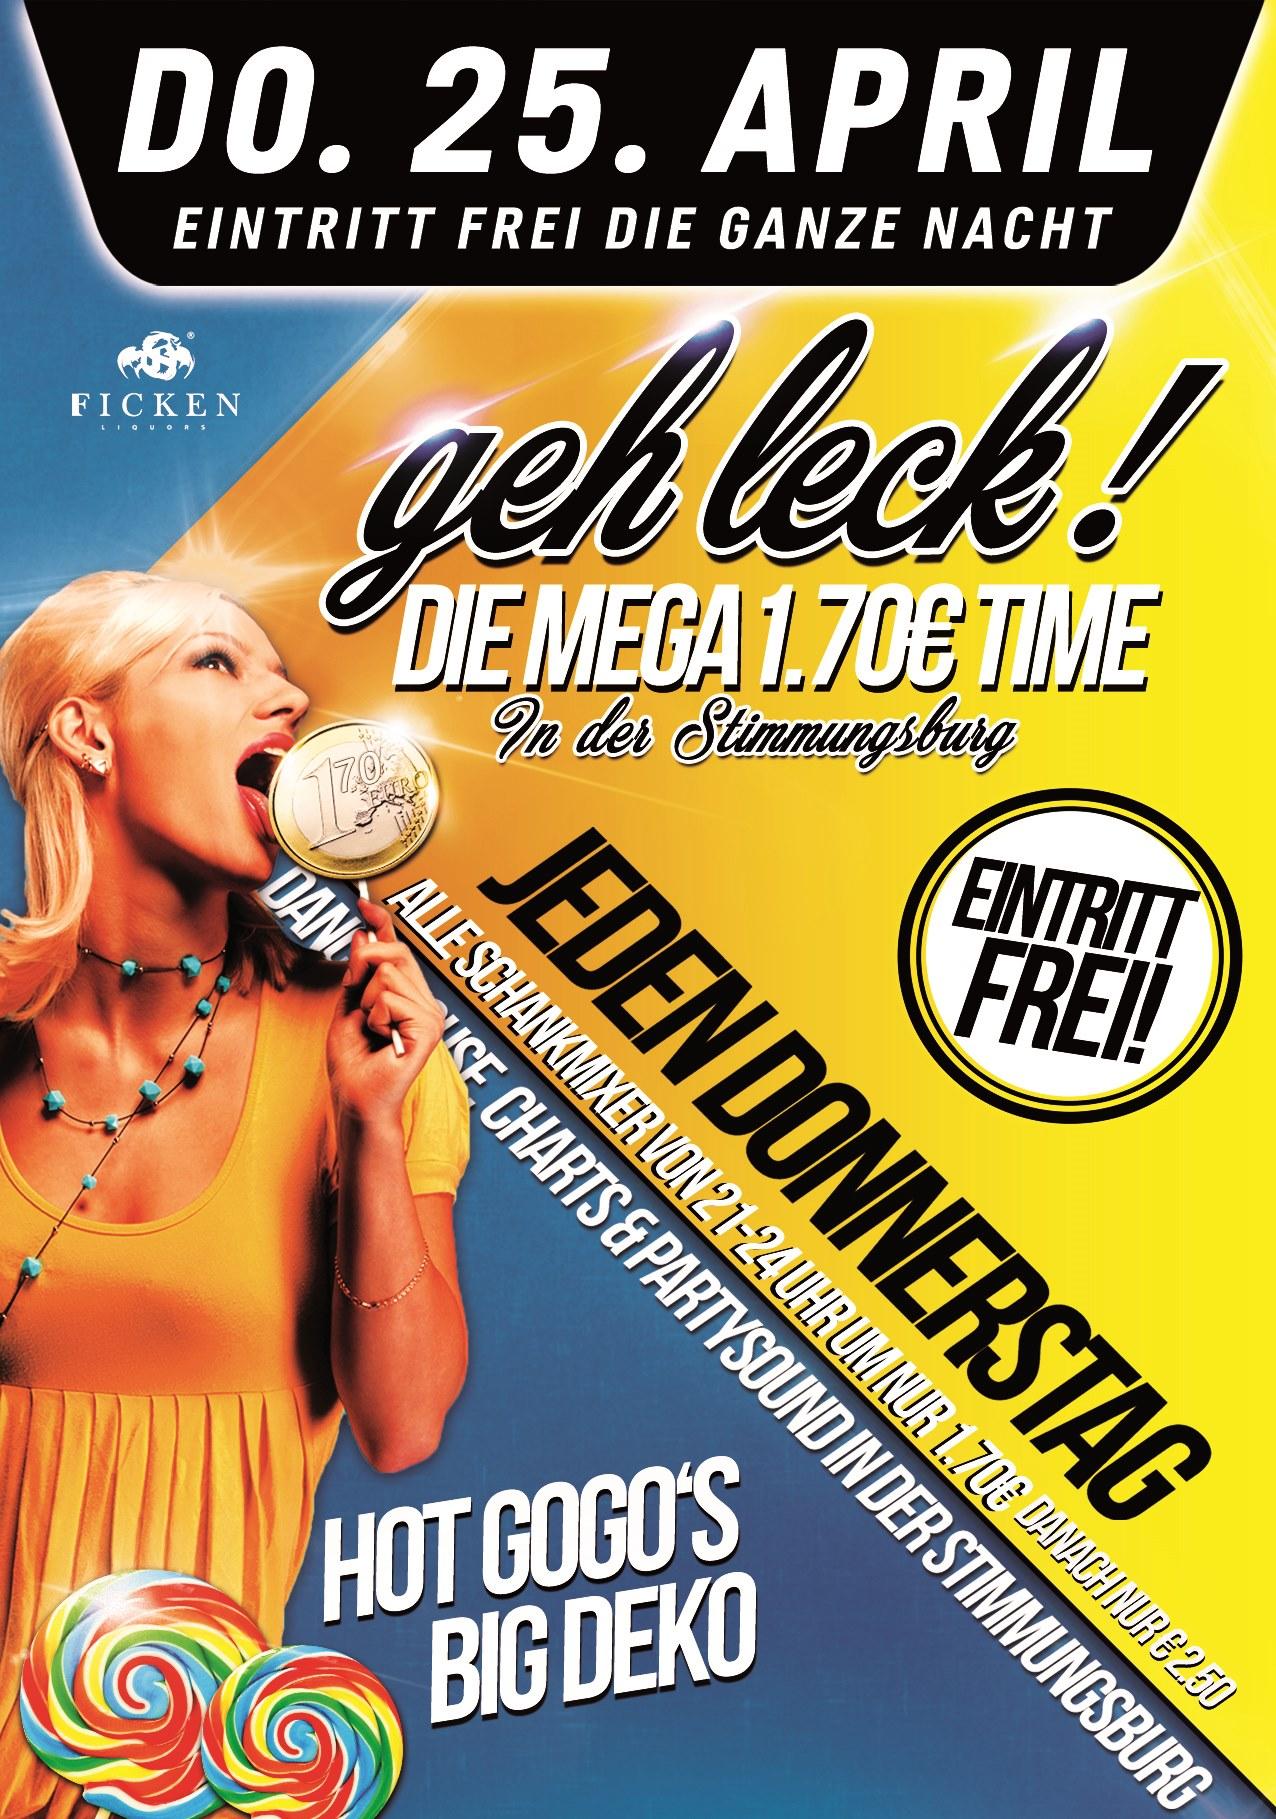 Geh leck! Die Mega 1.70€ Time Jeden Donnerstag!